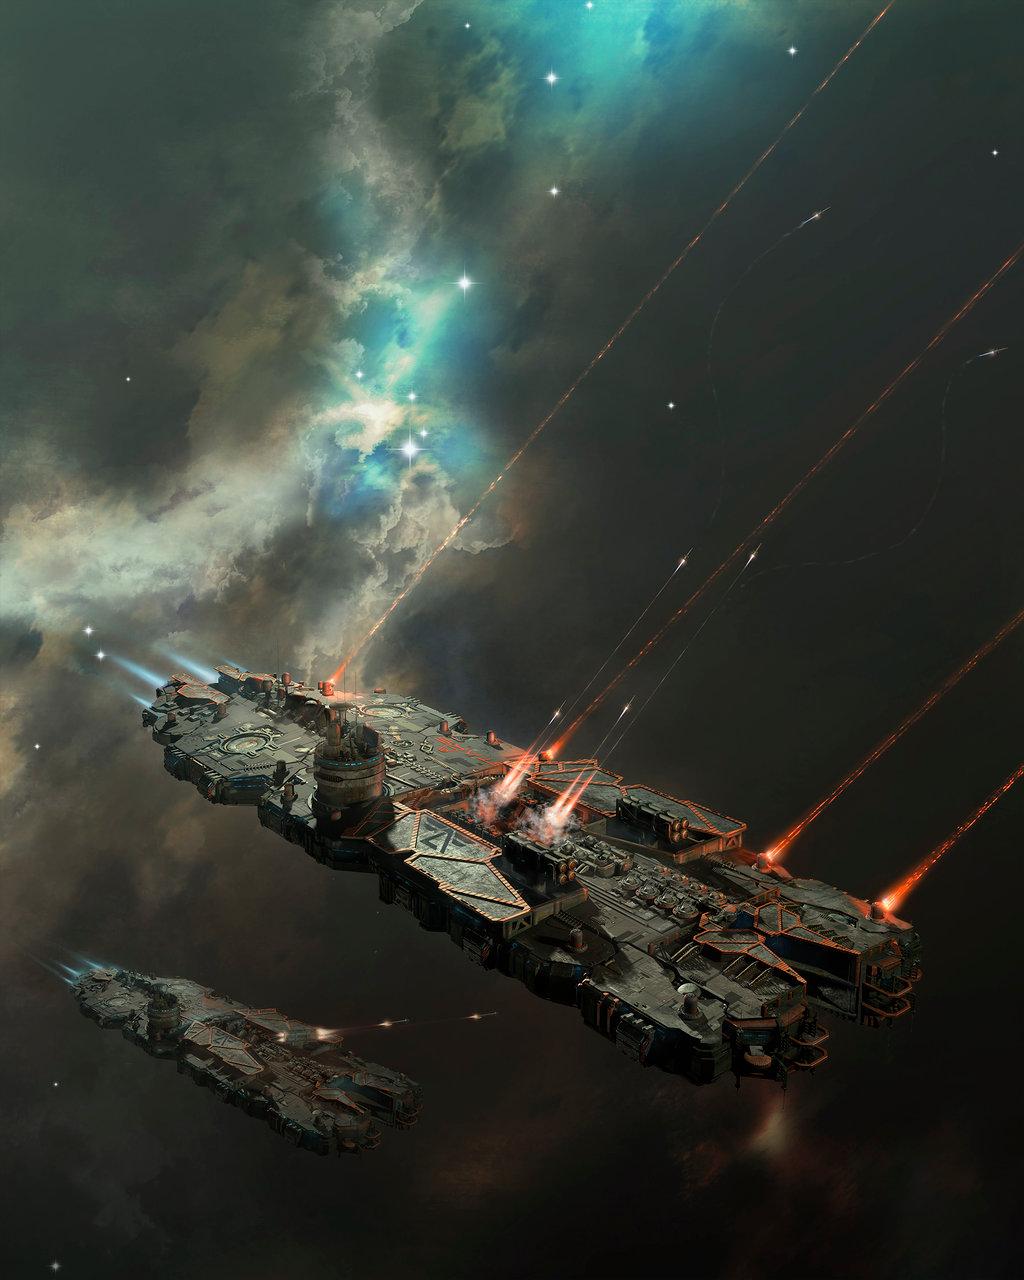 battlecruiser_on_a_mission_by_oshanin-d7ittxd